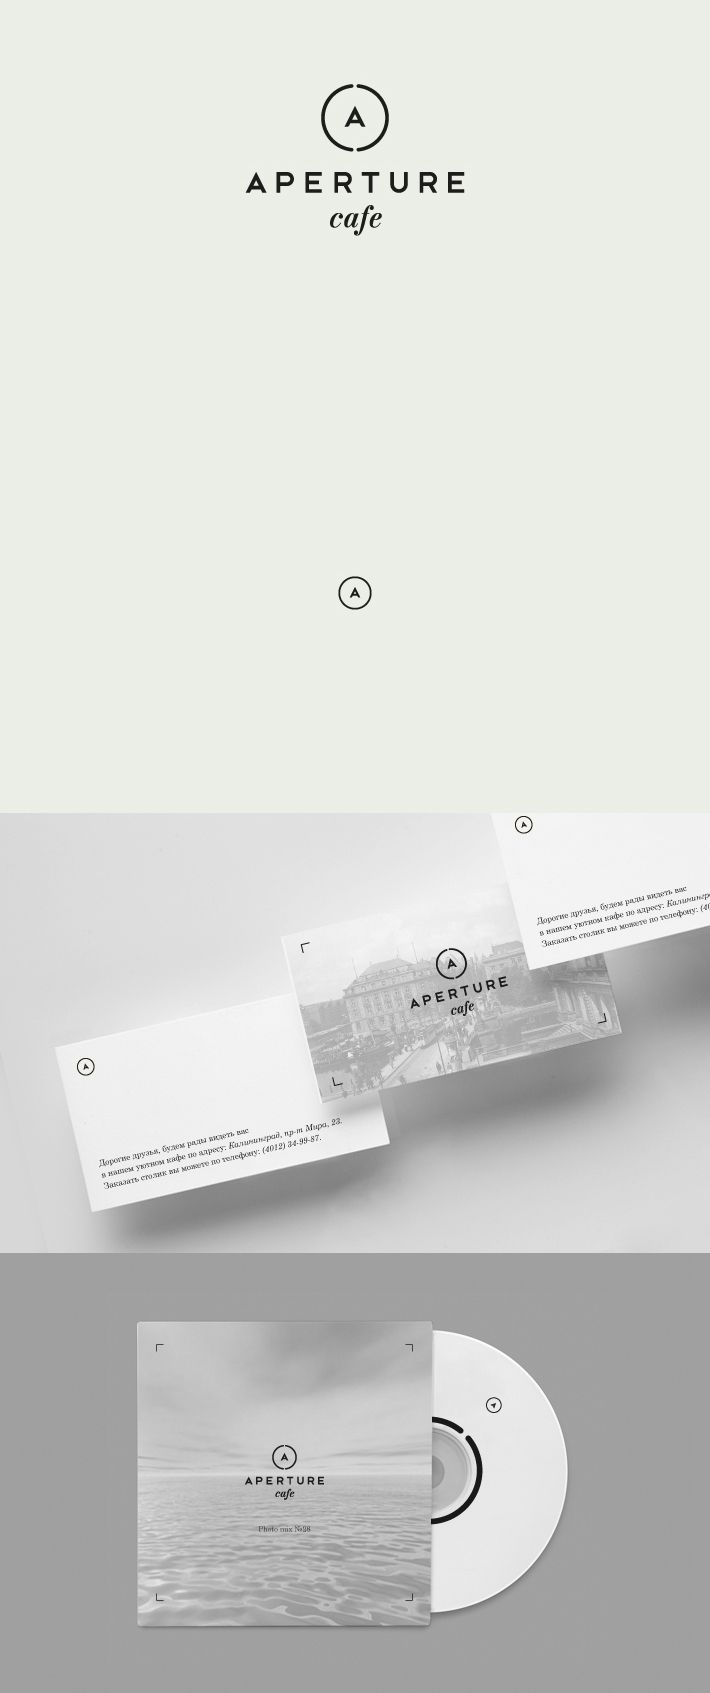 visual identity / Aperture